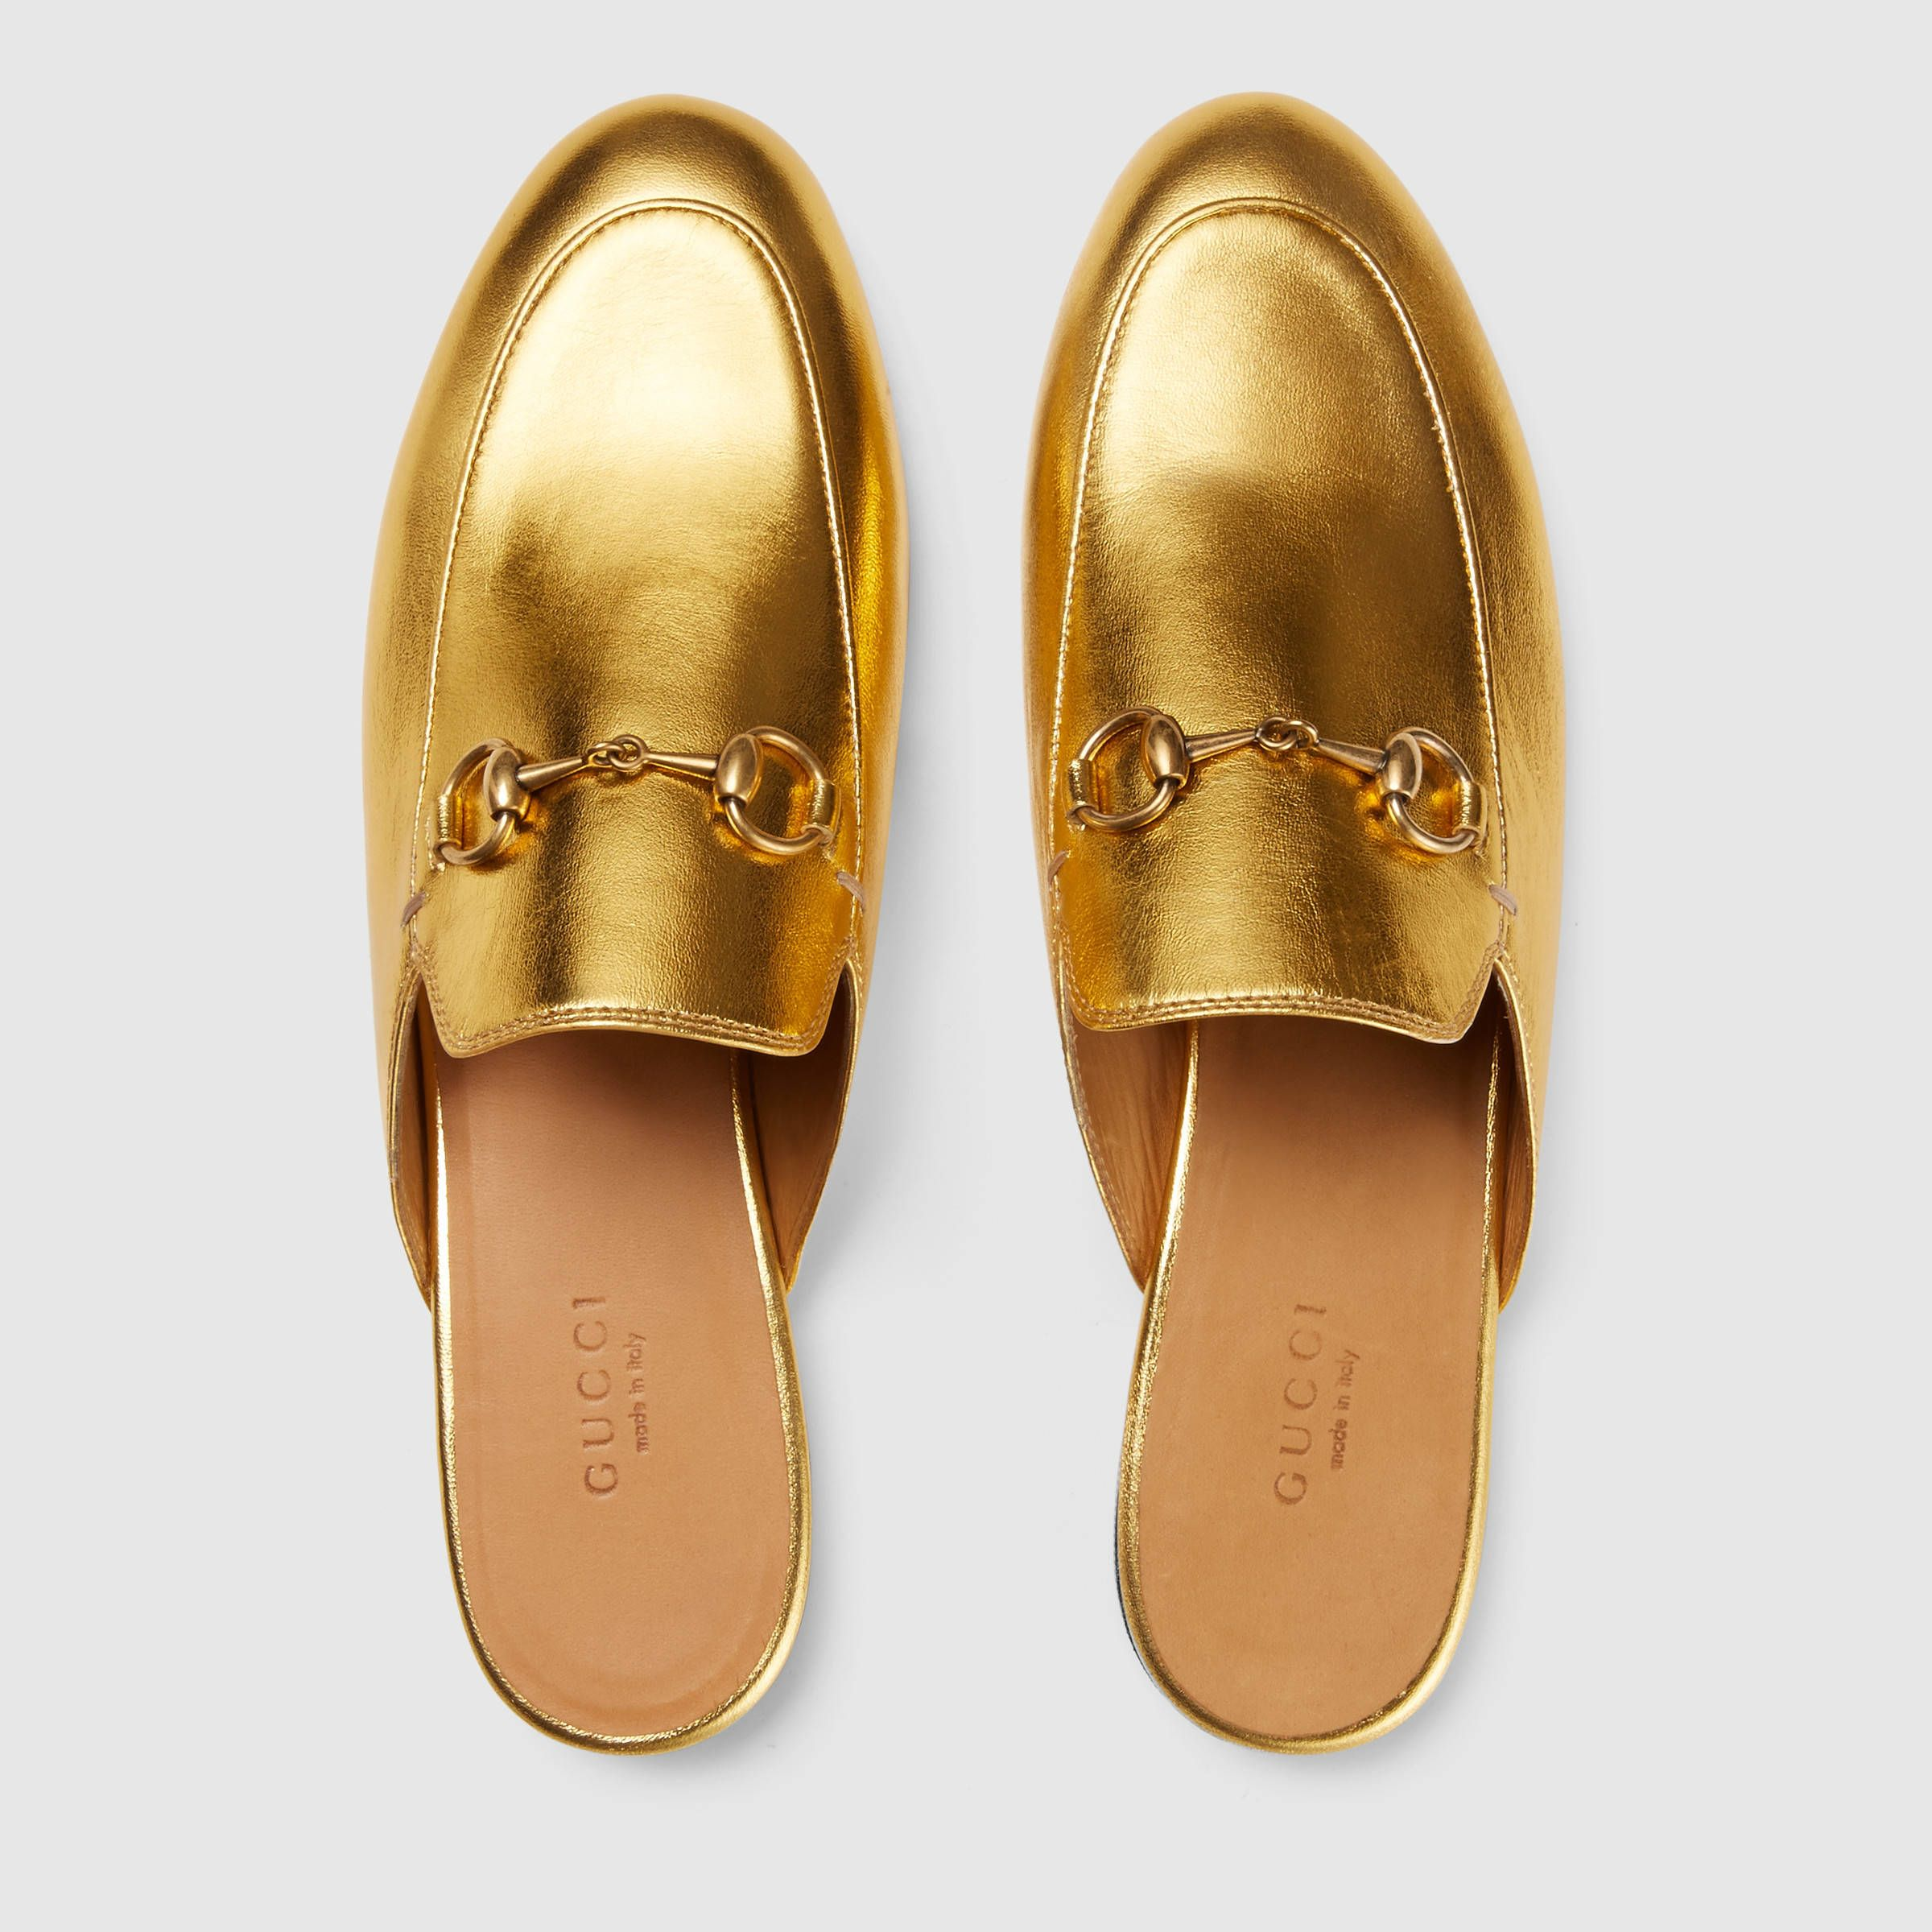 7b2d12599218 Gucci Women - Princetown metallic leather slipper - 423513B8B008016 ...